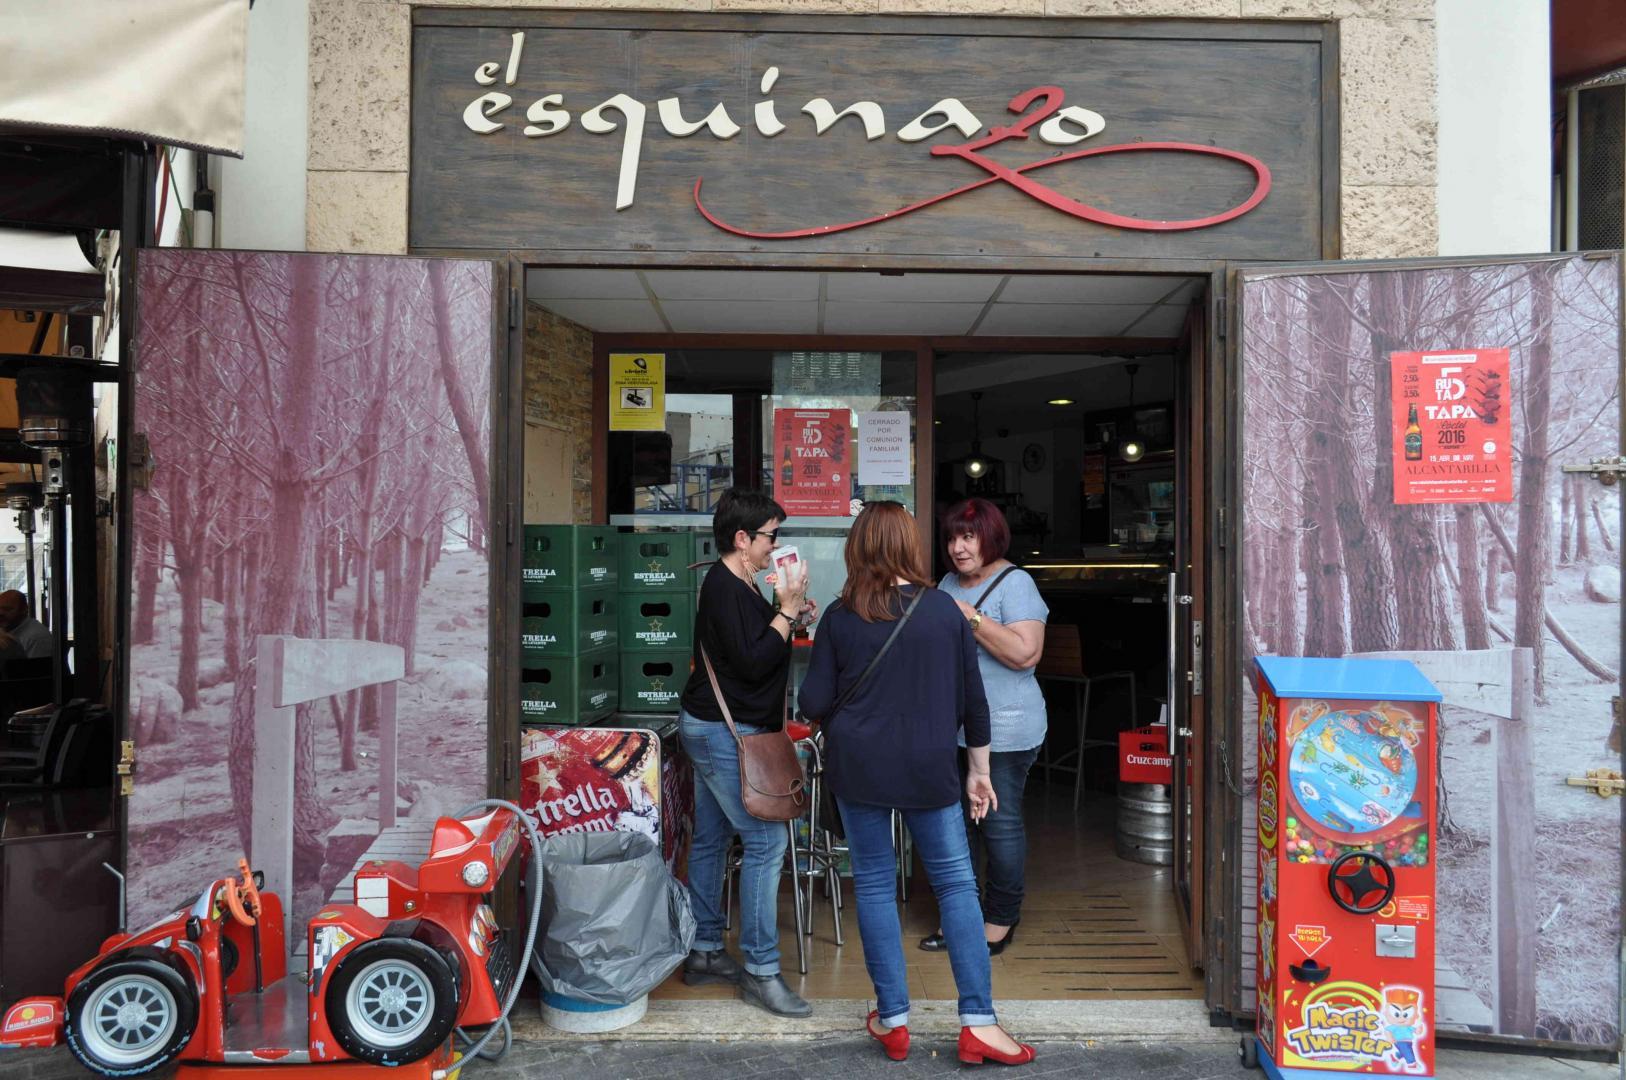 Ruta Tapa Alcantarilla 2016